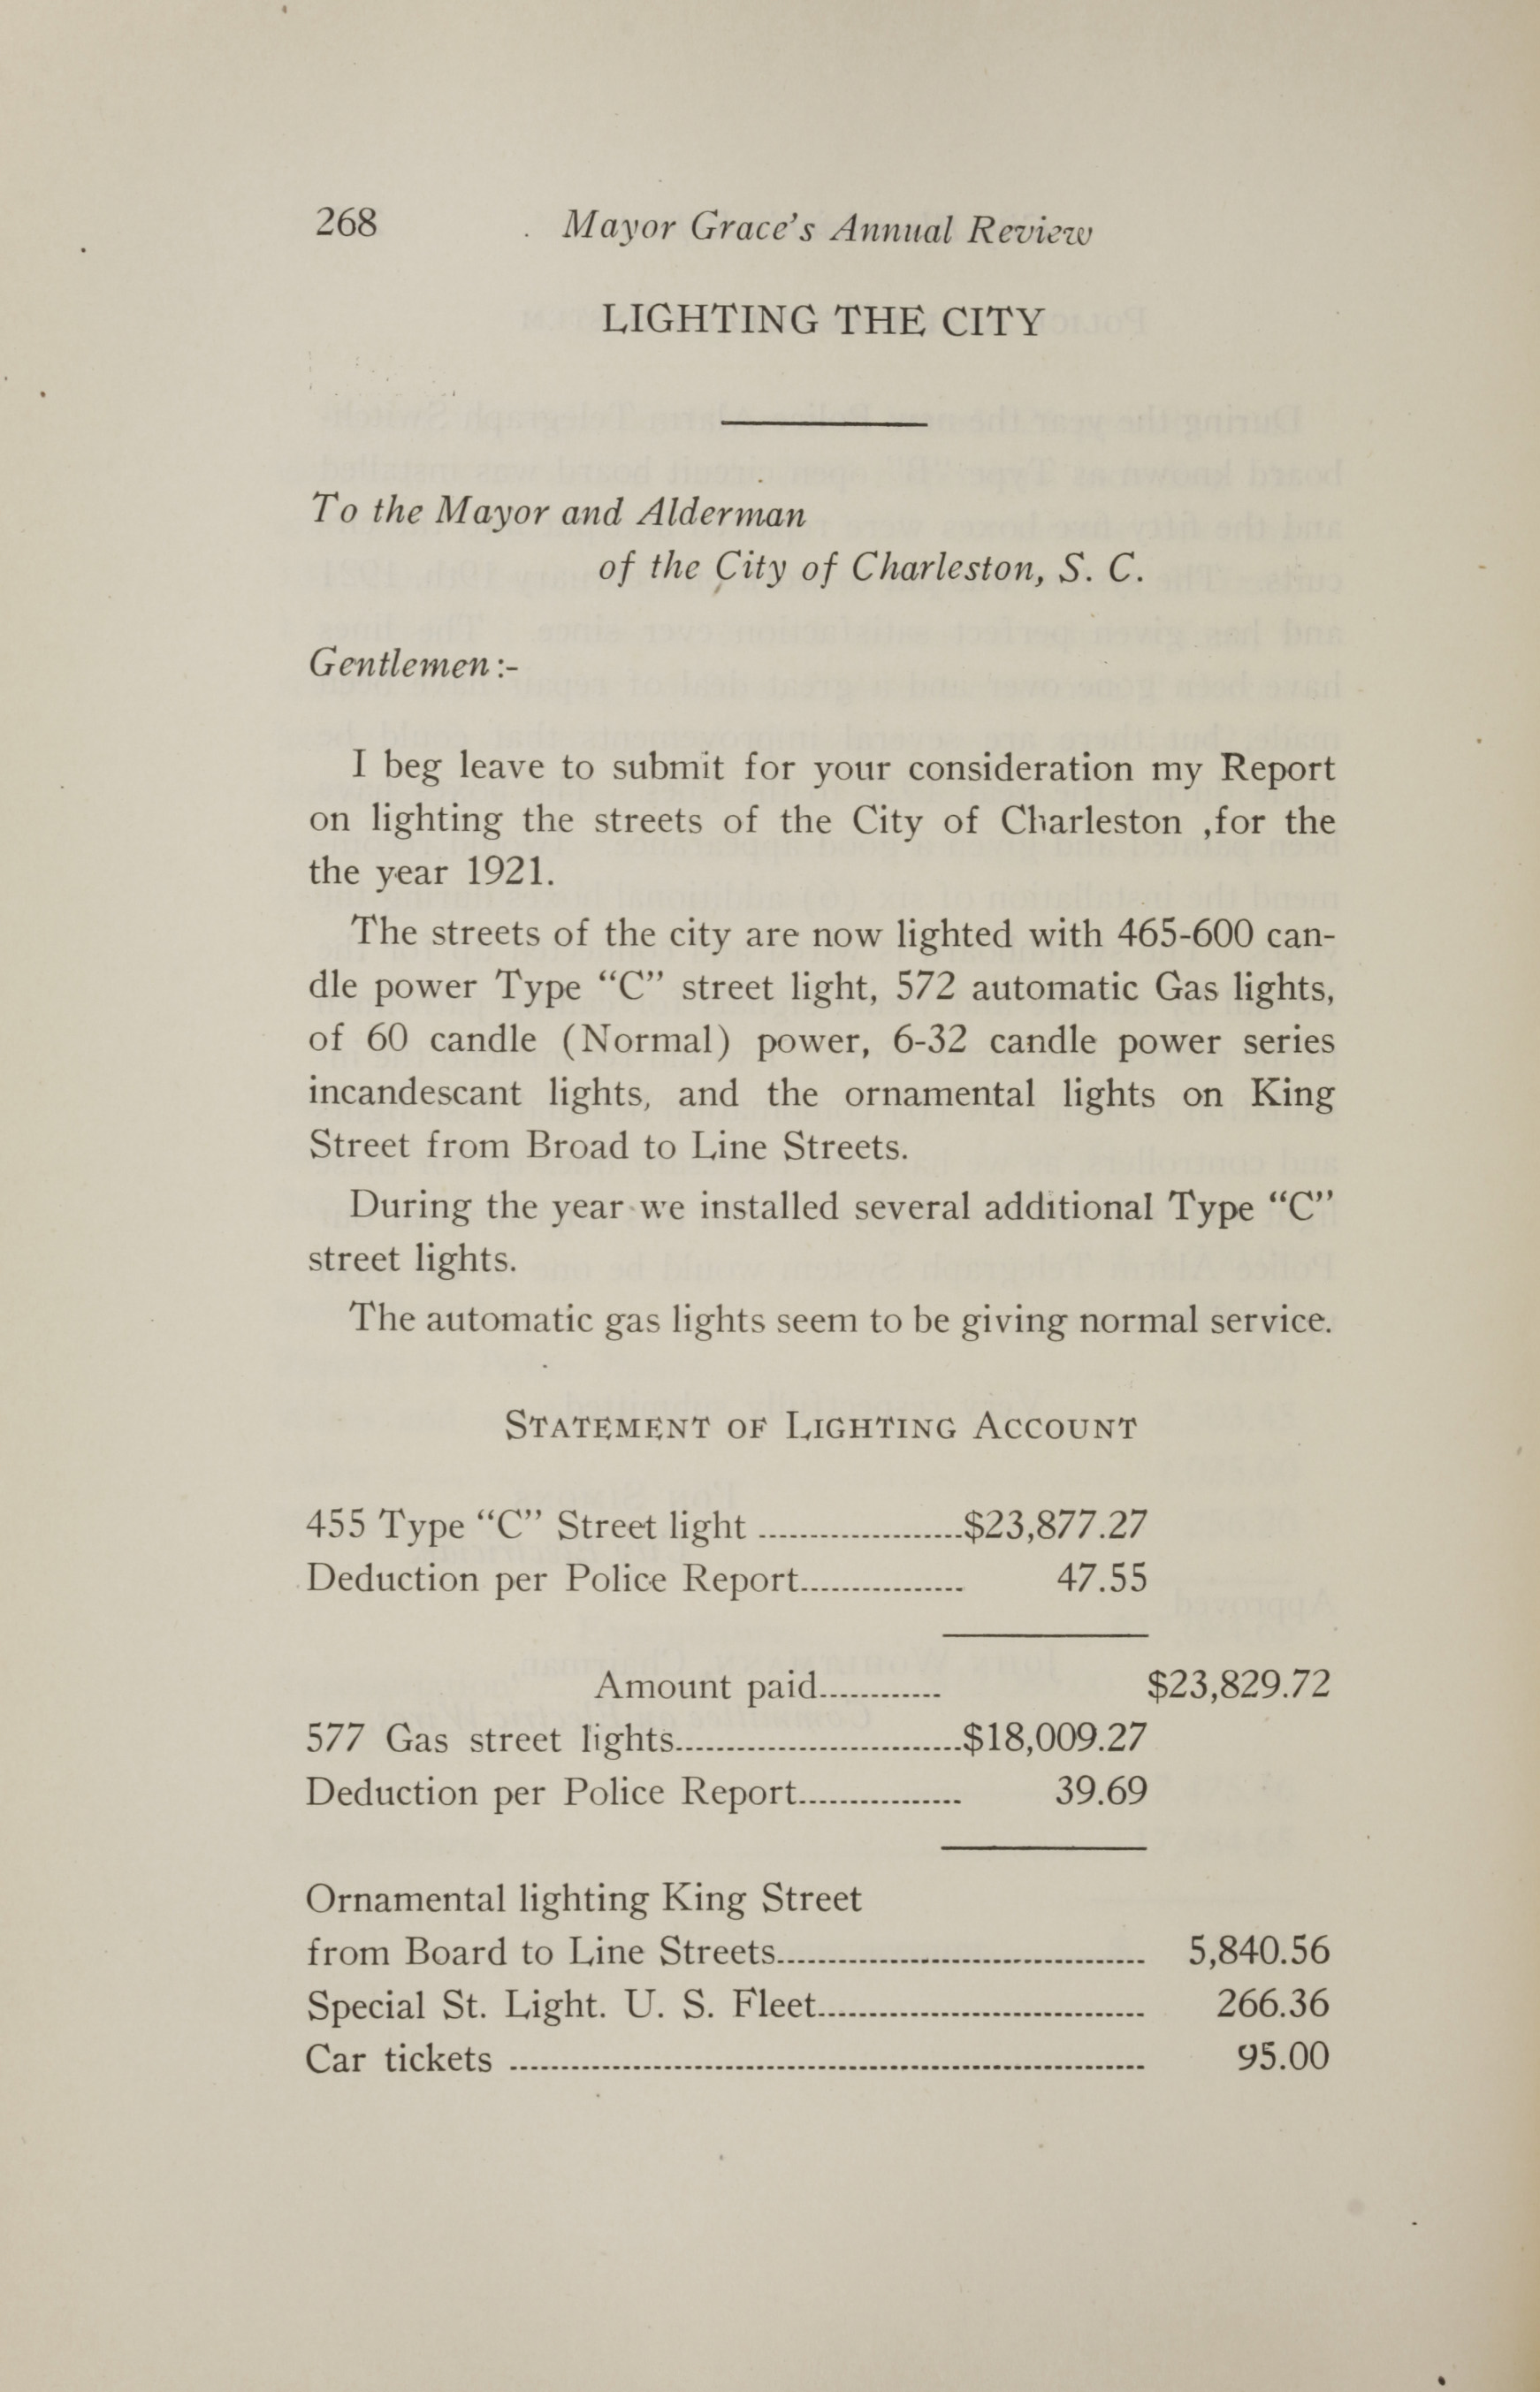 Charleston Yearbook, 1921, page 268